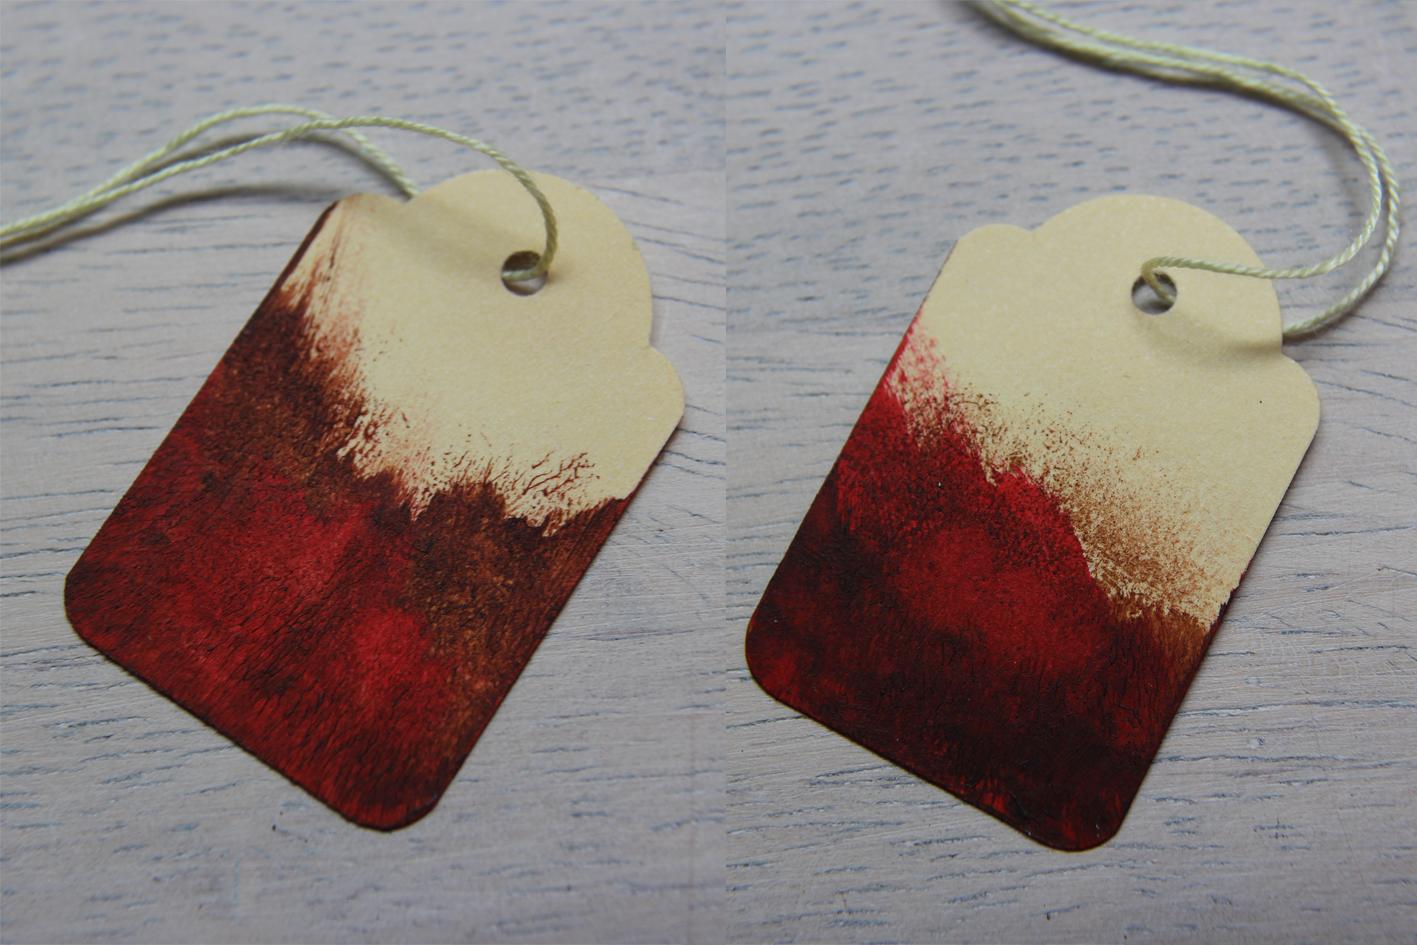 Bloodtag